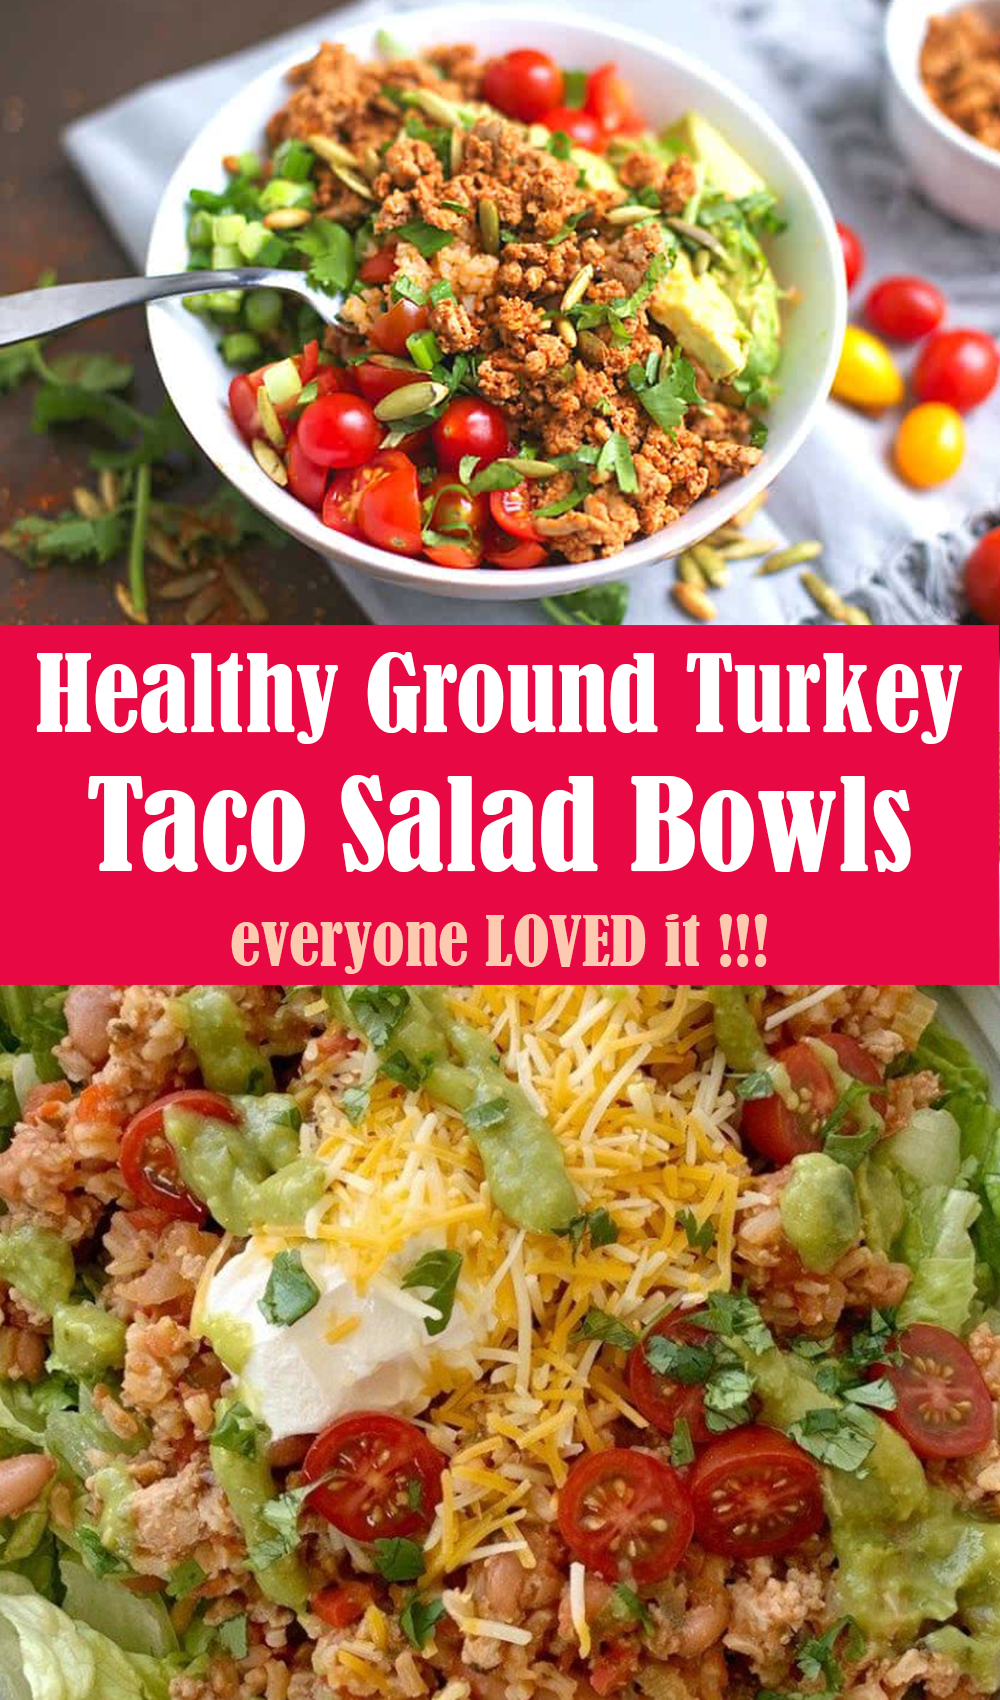 Healthy Ground Turkey Taco Salad Bowls